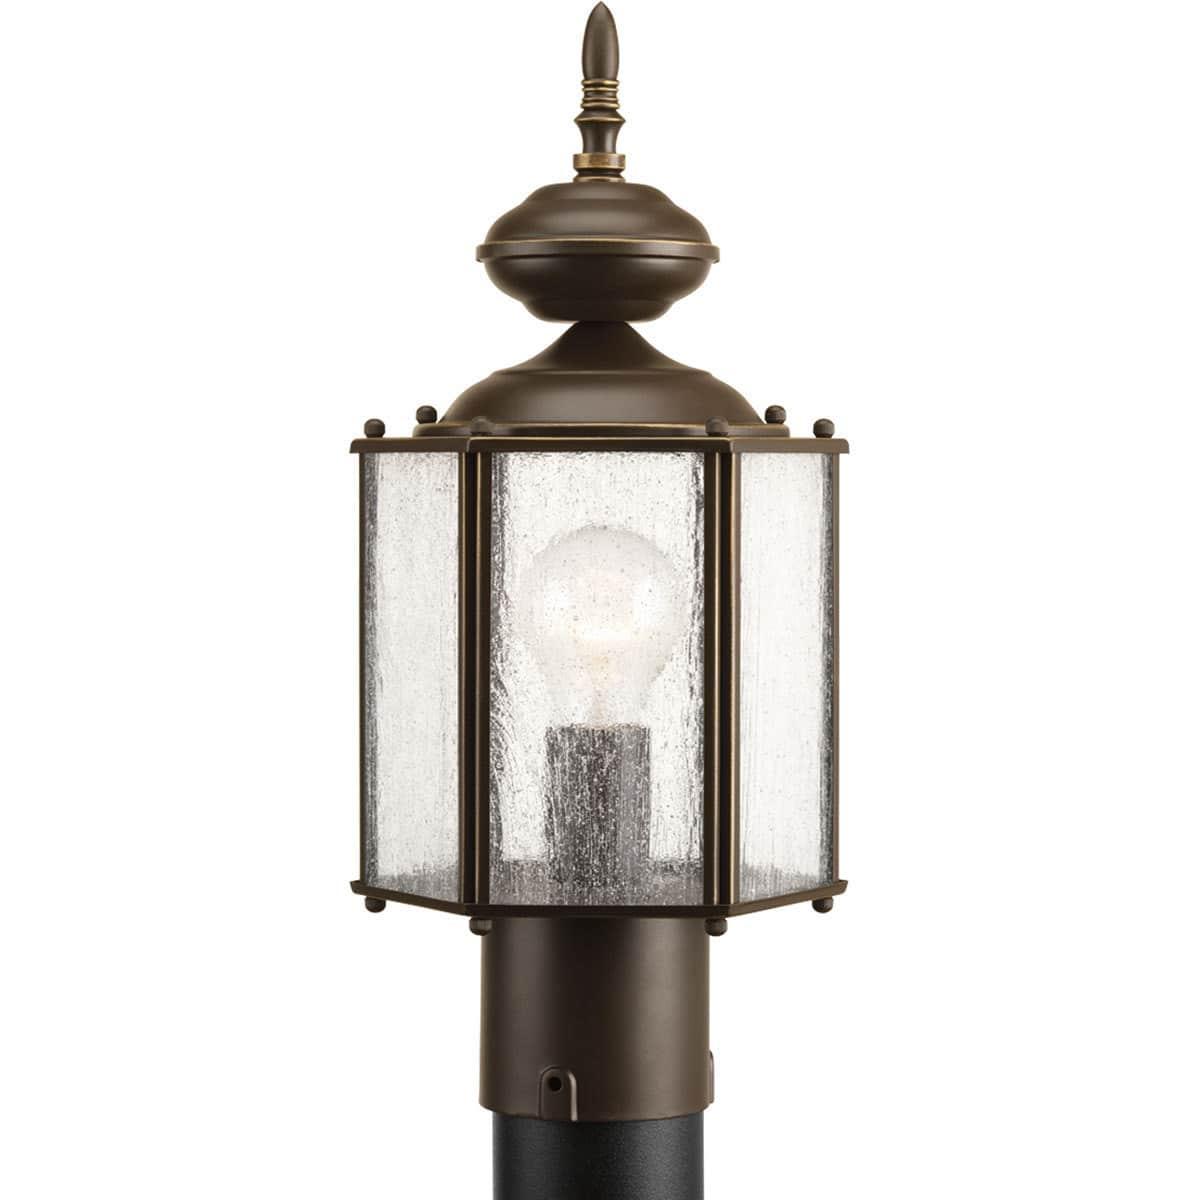 Solar Lights Home Bargains: Buy Solar Lighting Online At Overstock